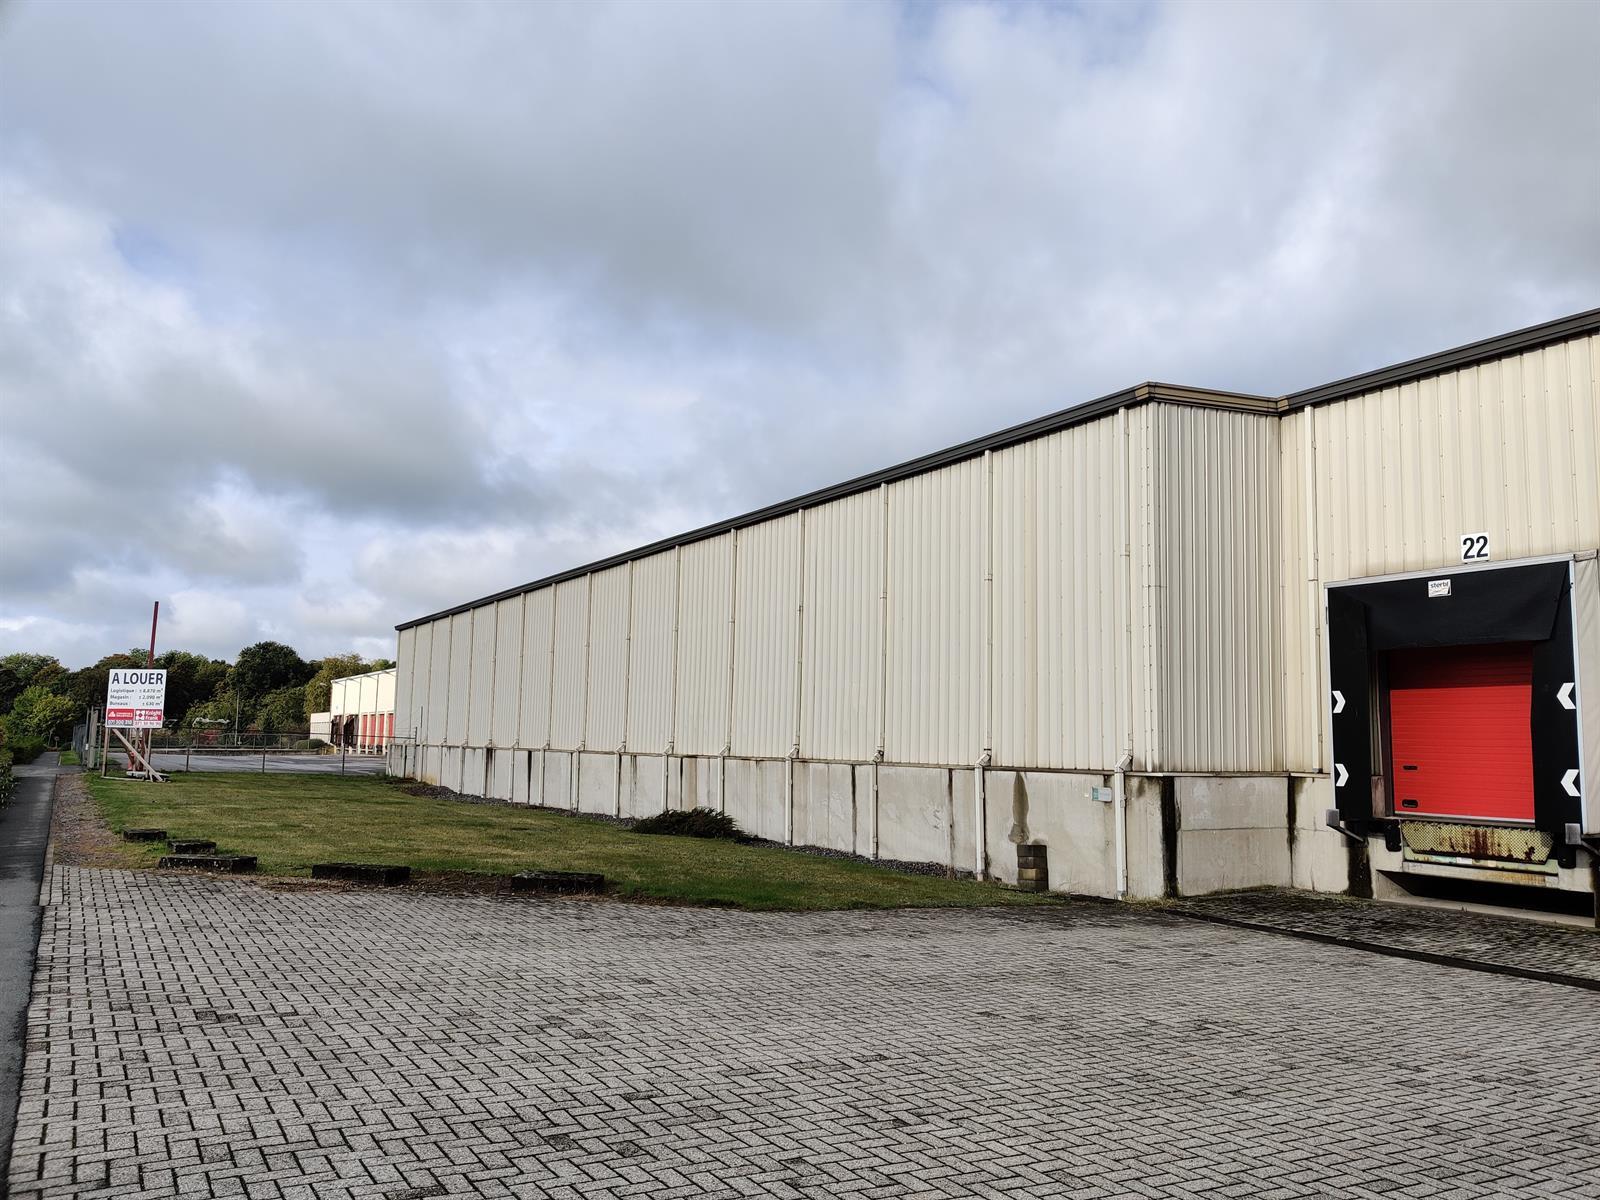 gebouw voor gemengd gebruik te huur I173 - Quatrieme Rue , 6040 Charleroi Jumet, België 3